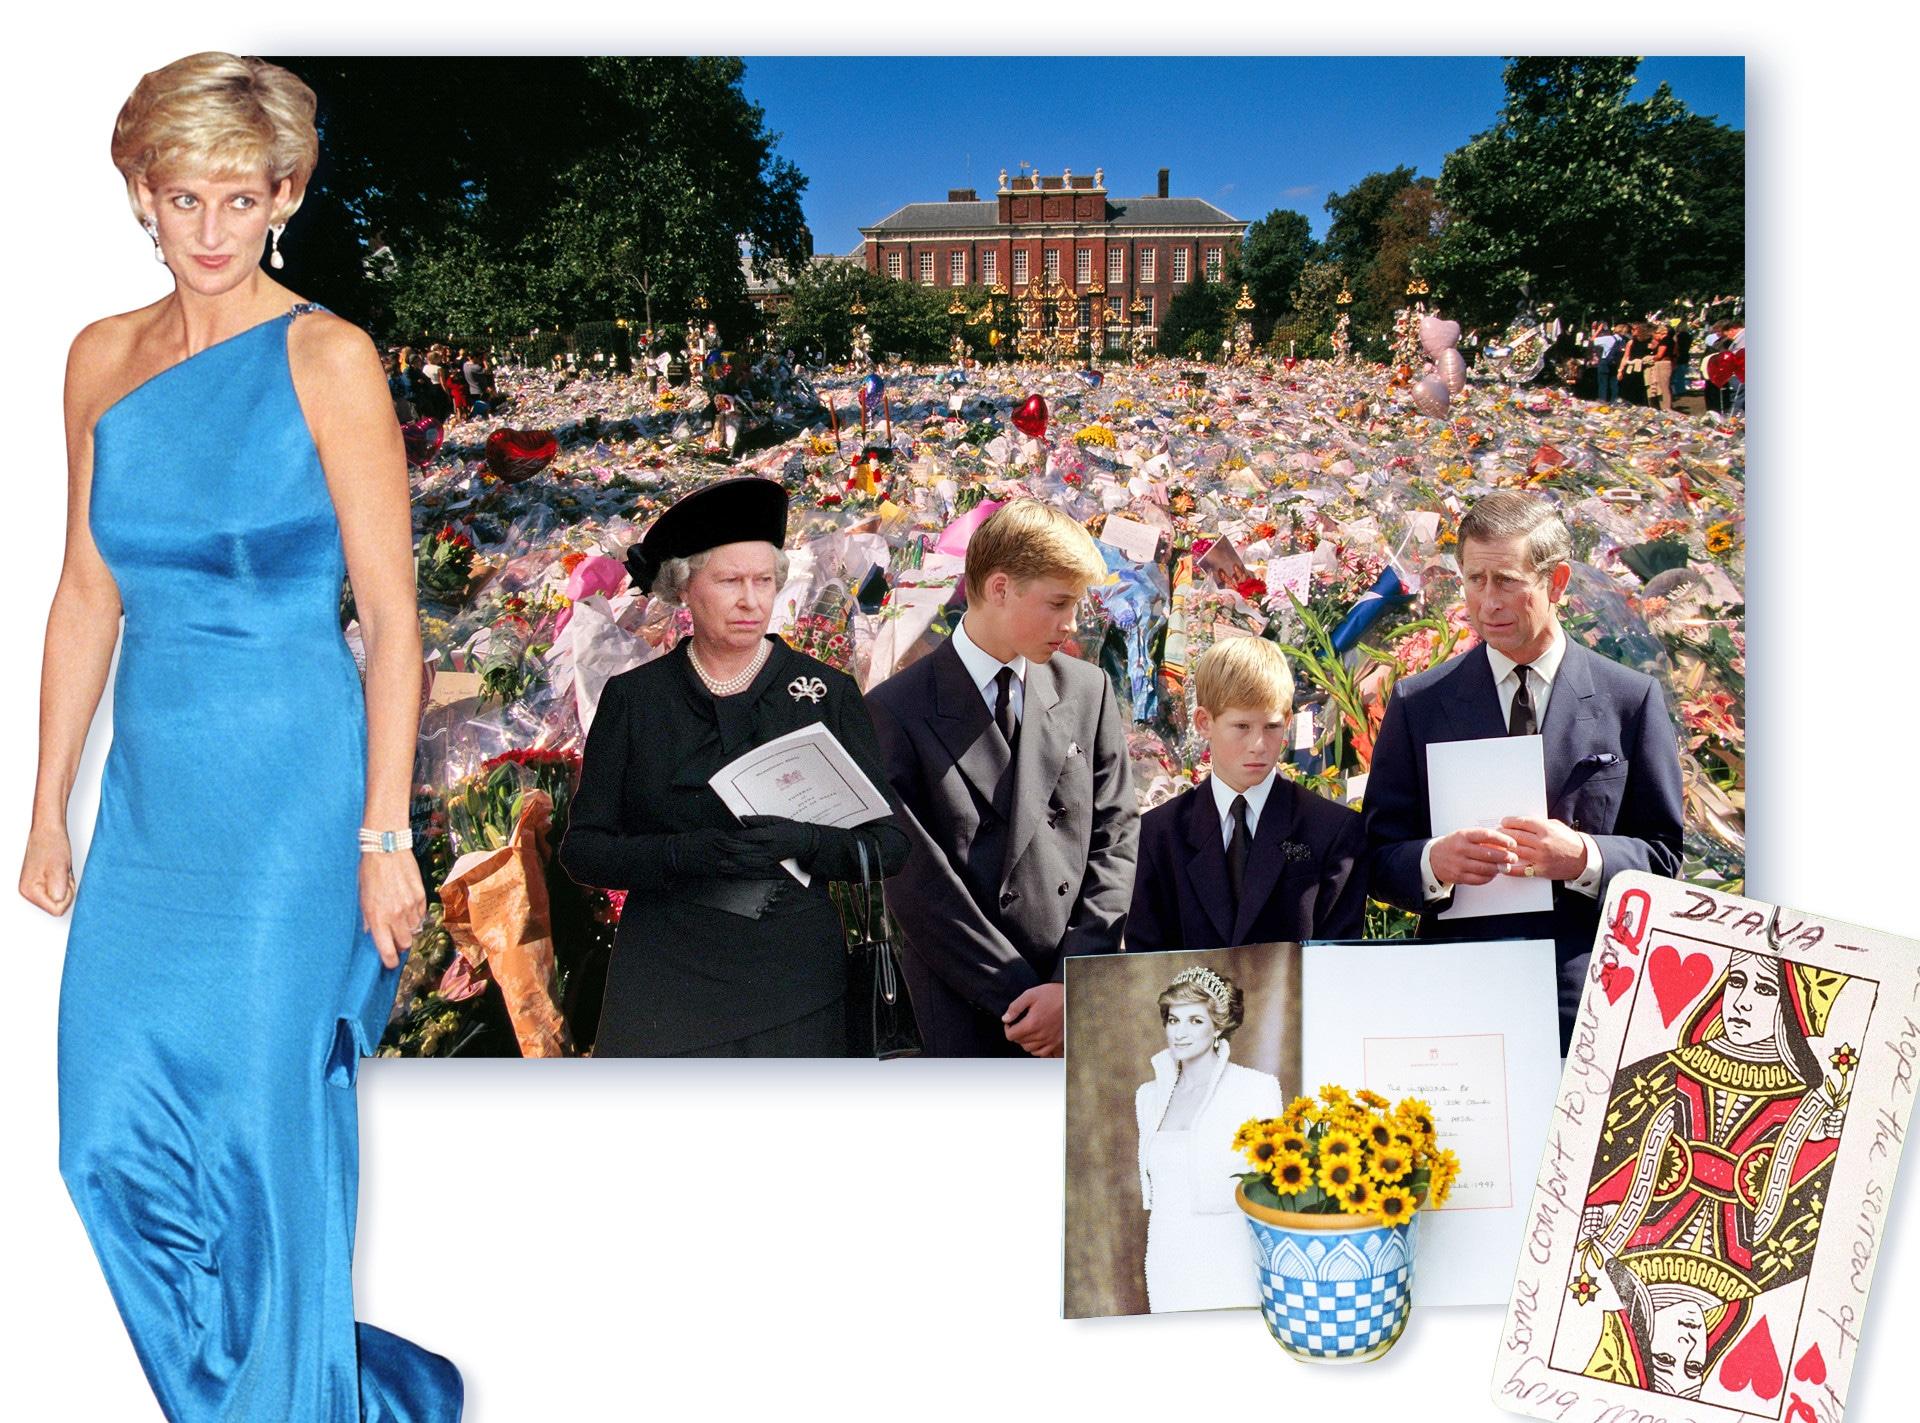 Royal Family's Reaction to Princess Diana's Death